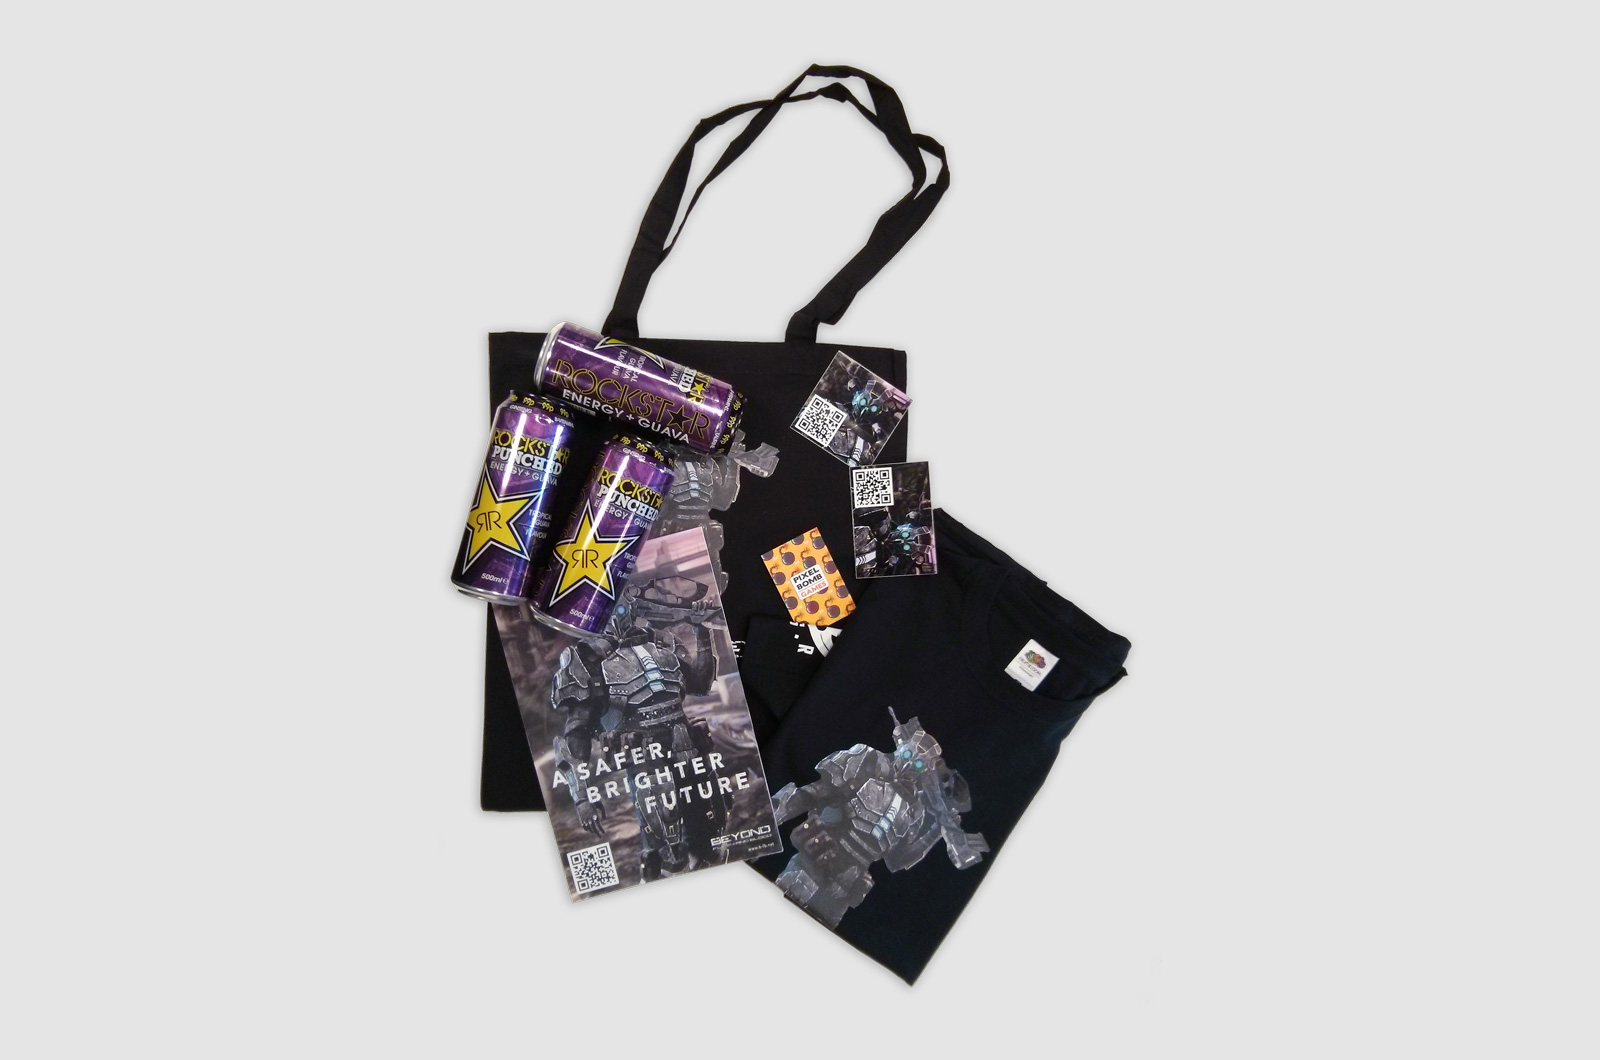 Beyond Flesh and Blood Event Give-away bag 01